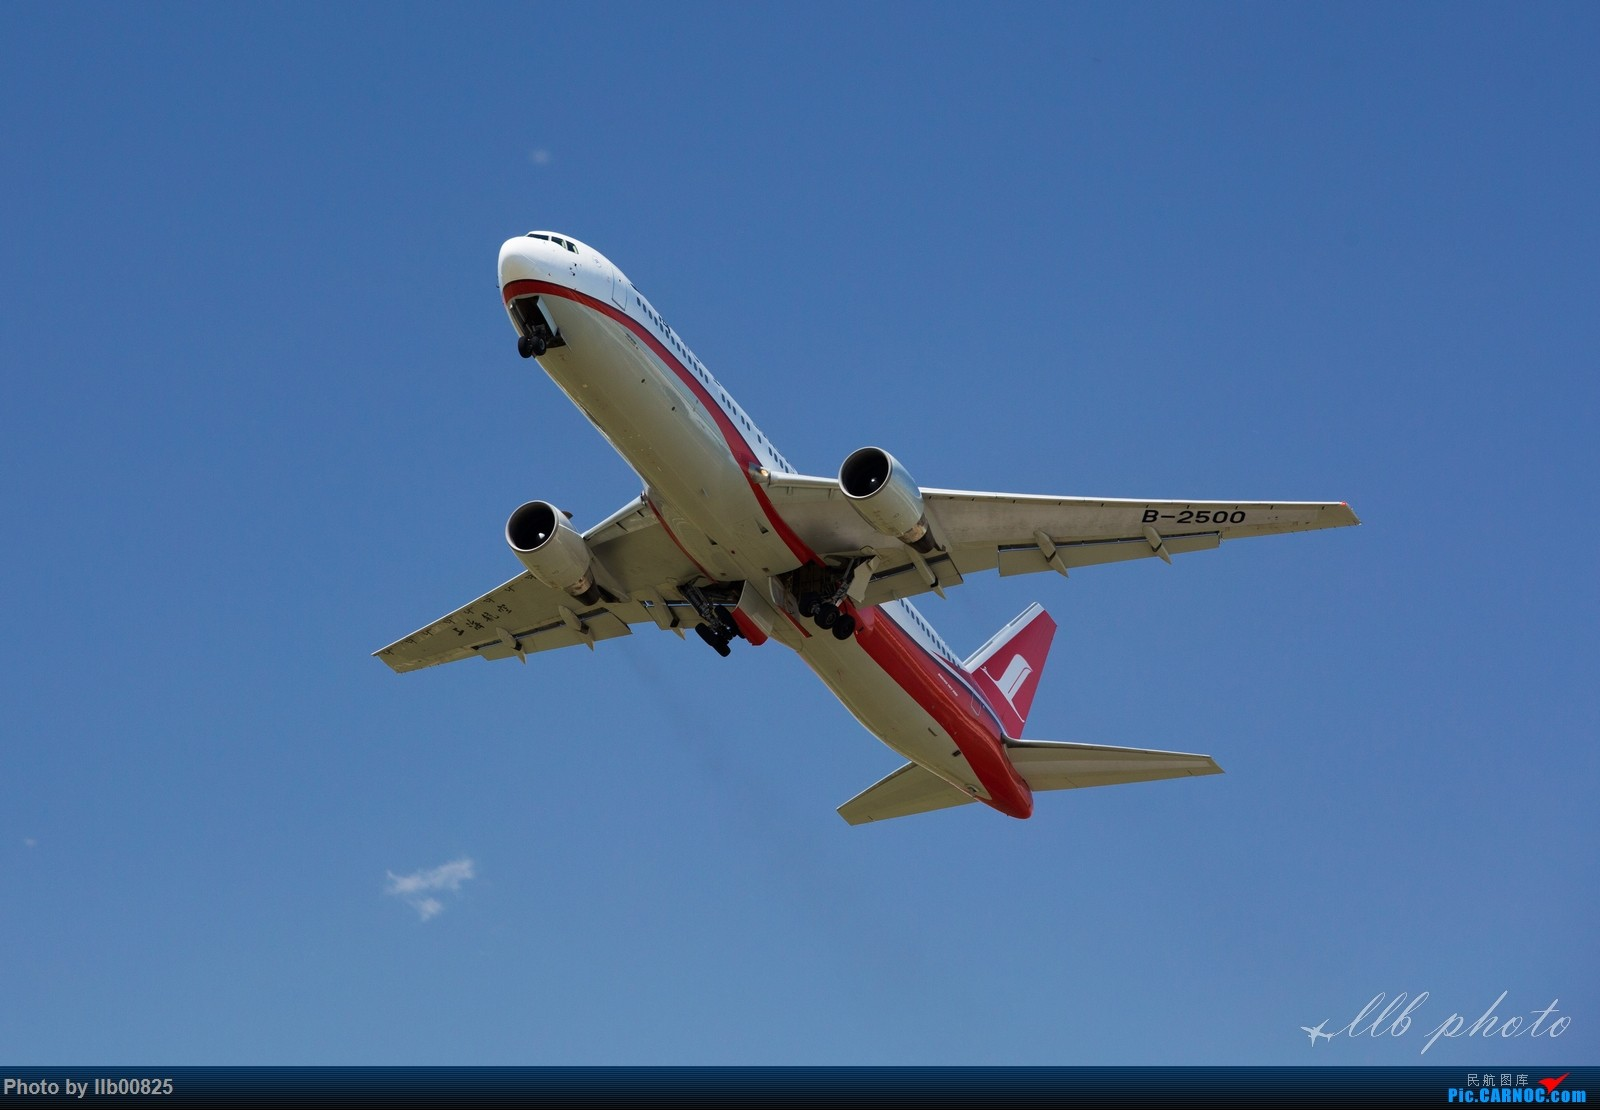 Re:[原创]XIY雨过天晴 BOEING 767-300 B-2500 中国西安咸阳国际机场